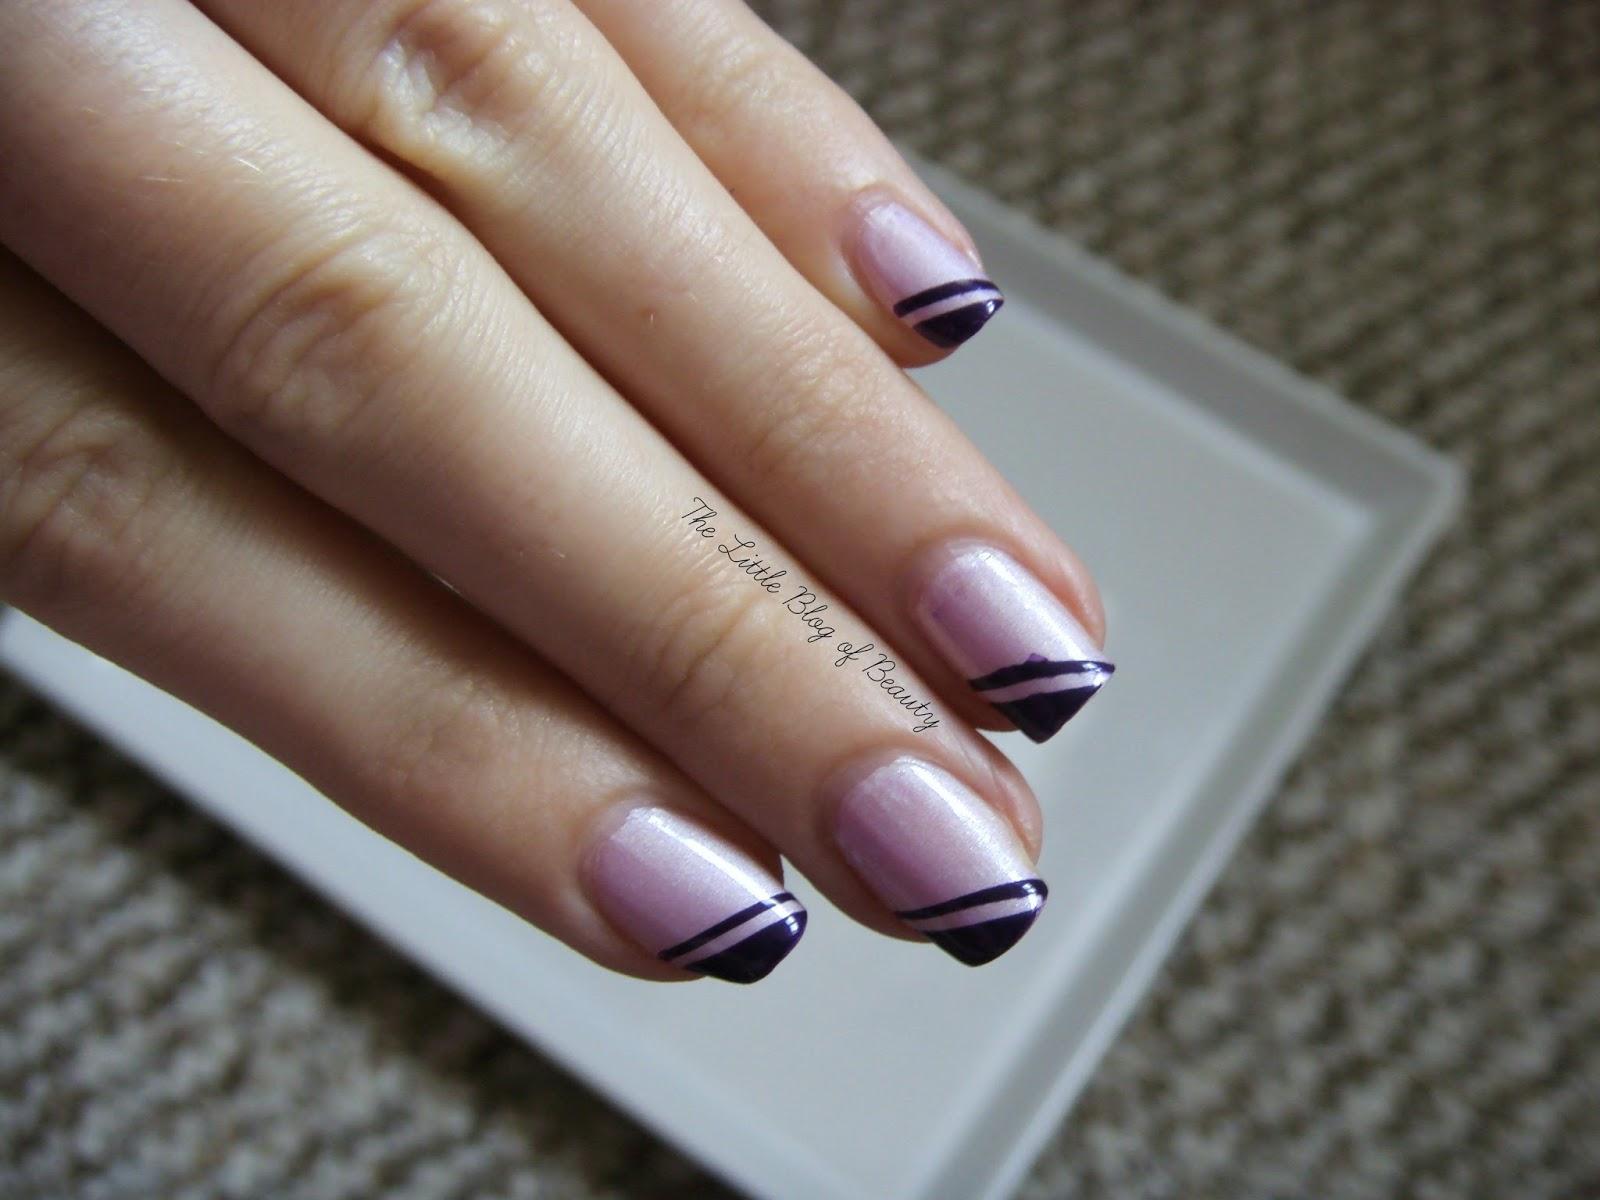 Nail art - Geometric corners